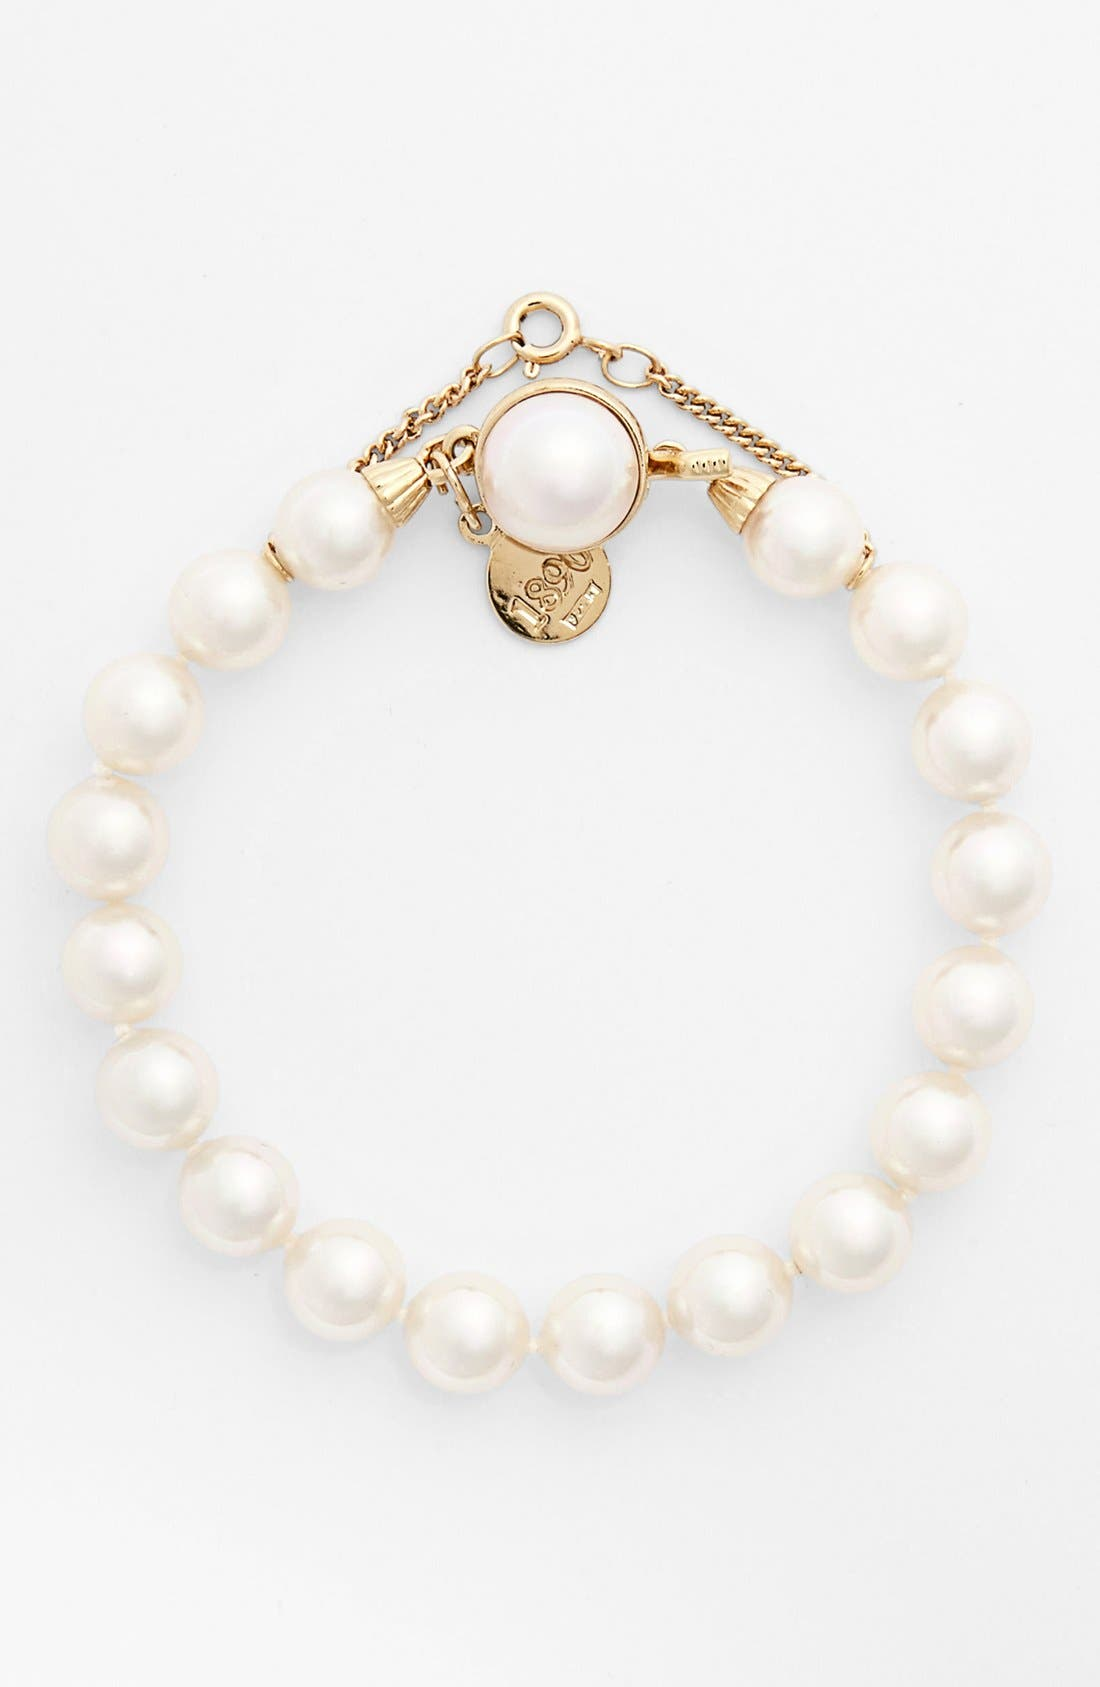 8mm Single Row Pearl Bracelet,                         Main,                         color, WHITE/ GOLD